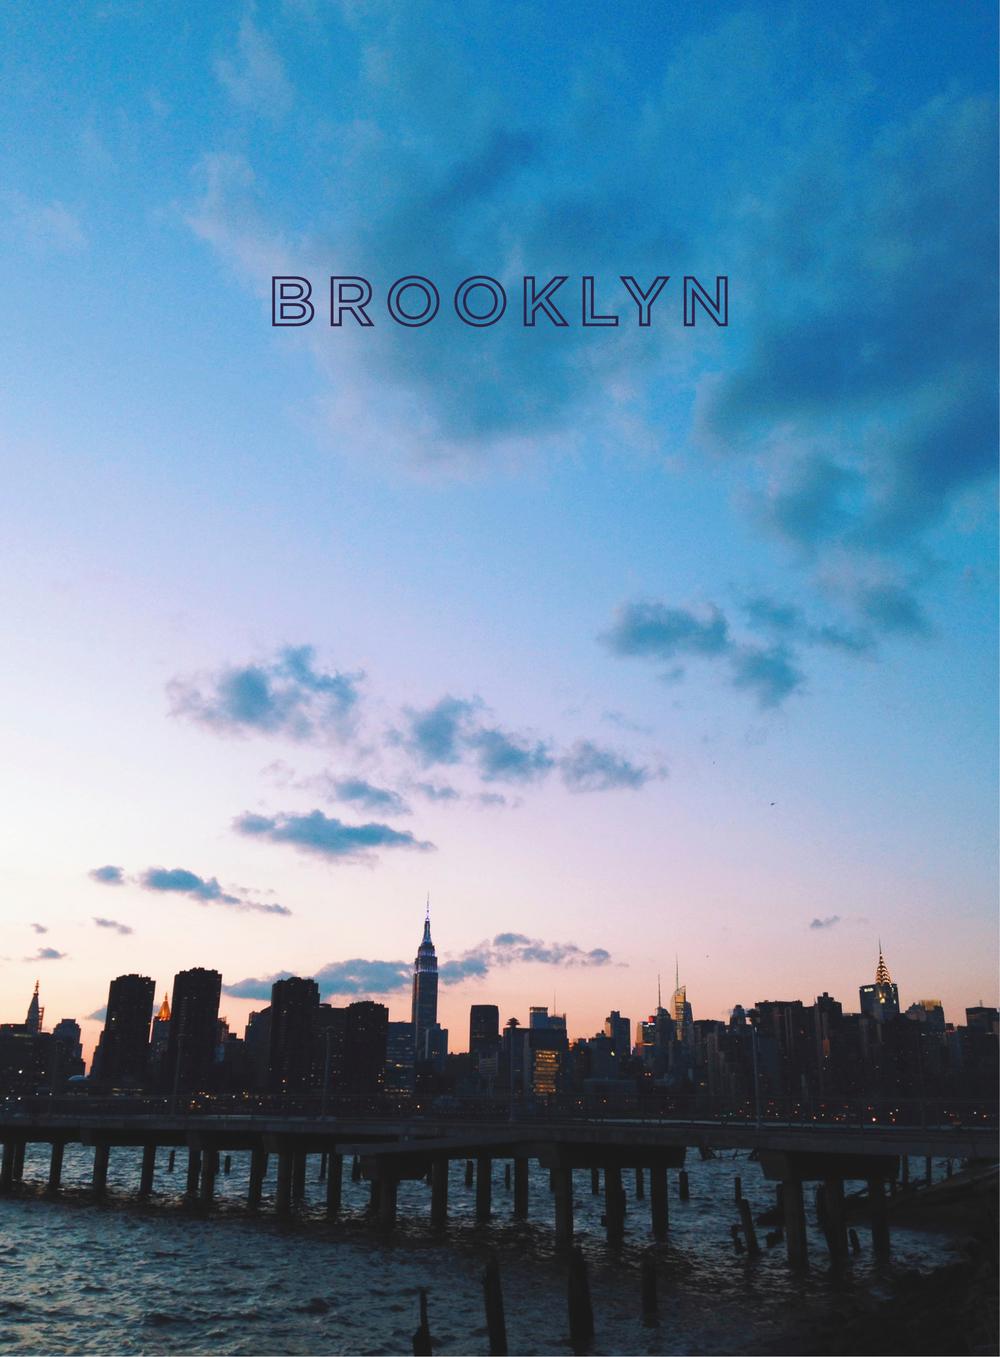 brooklyn | sally mussellwhite